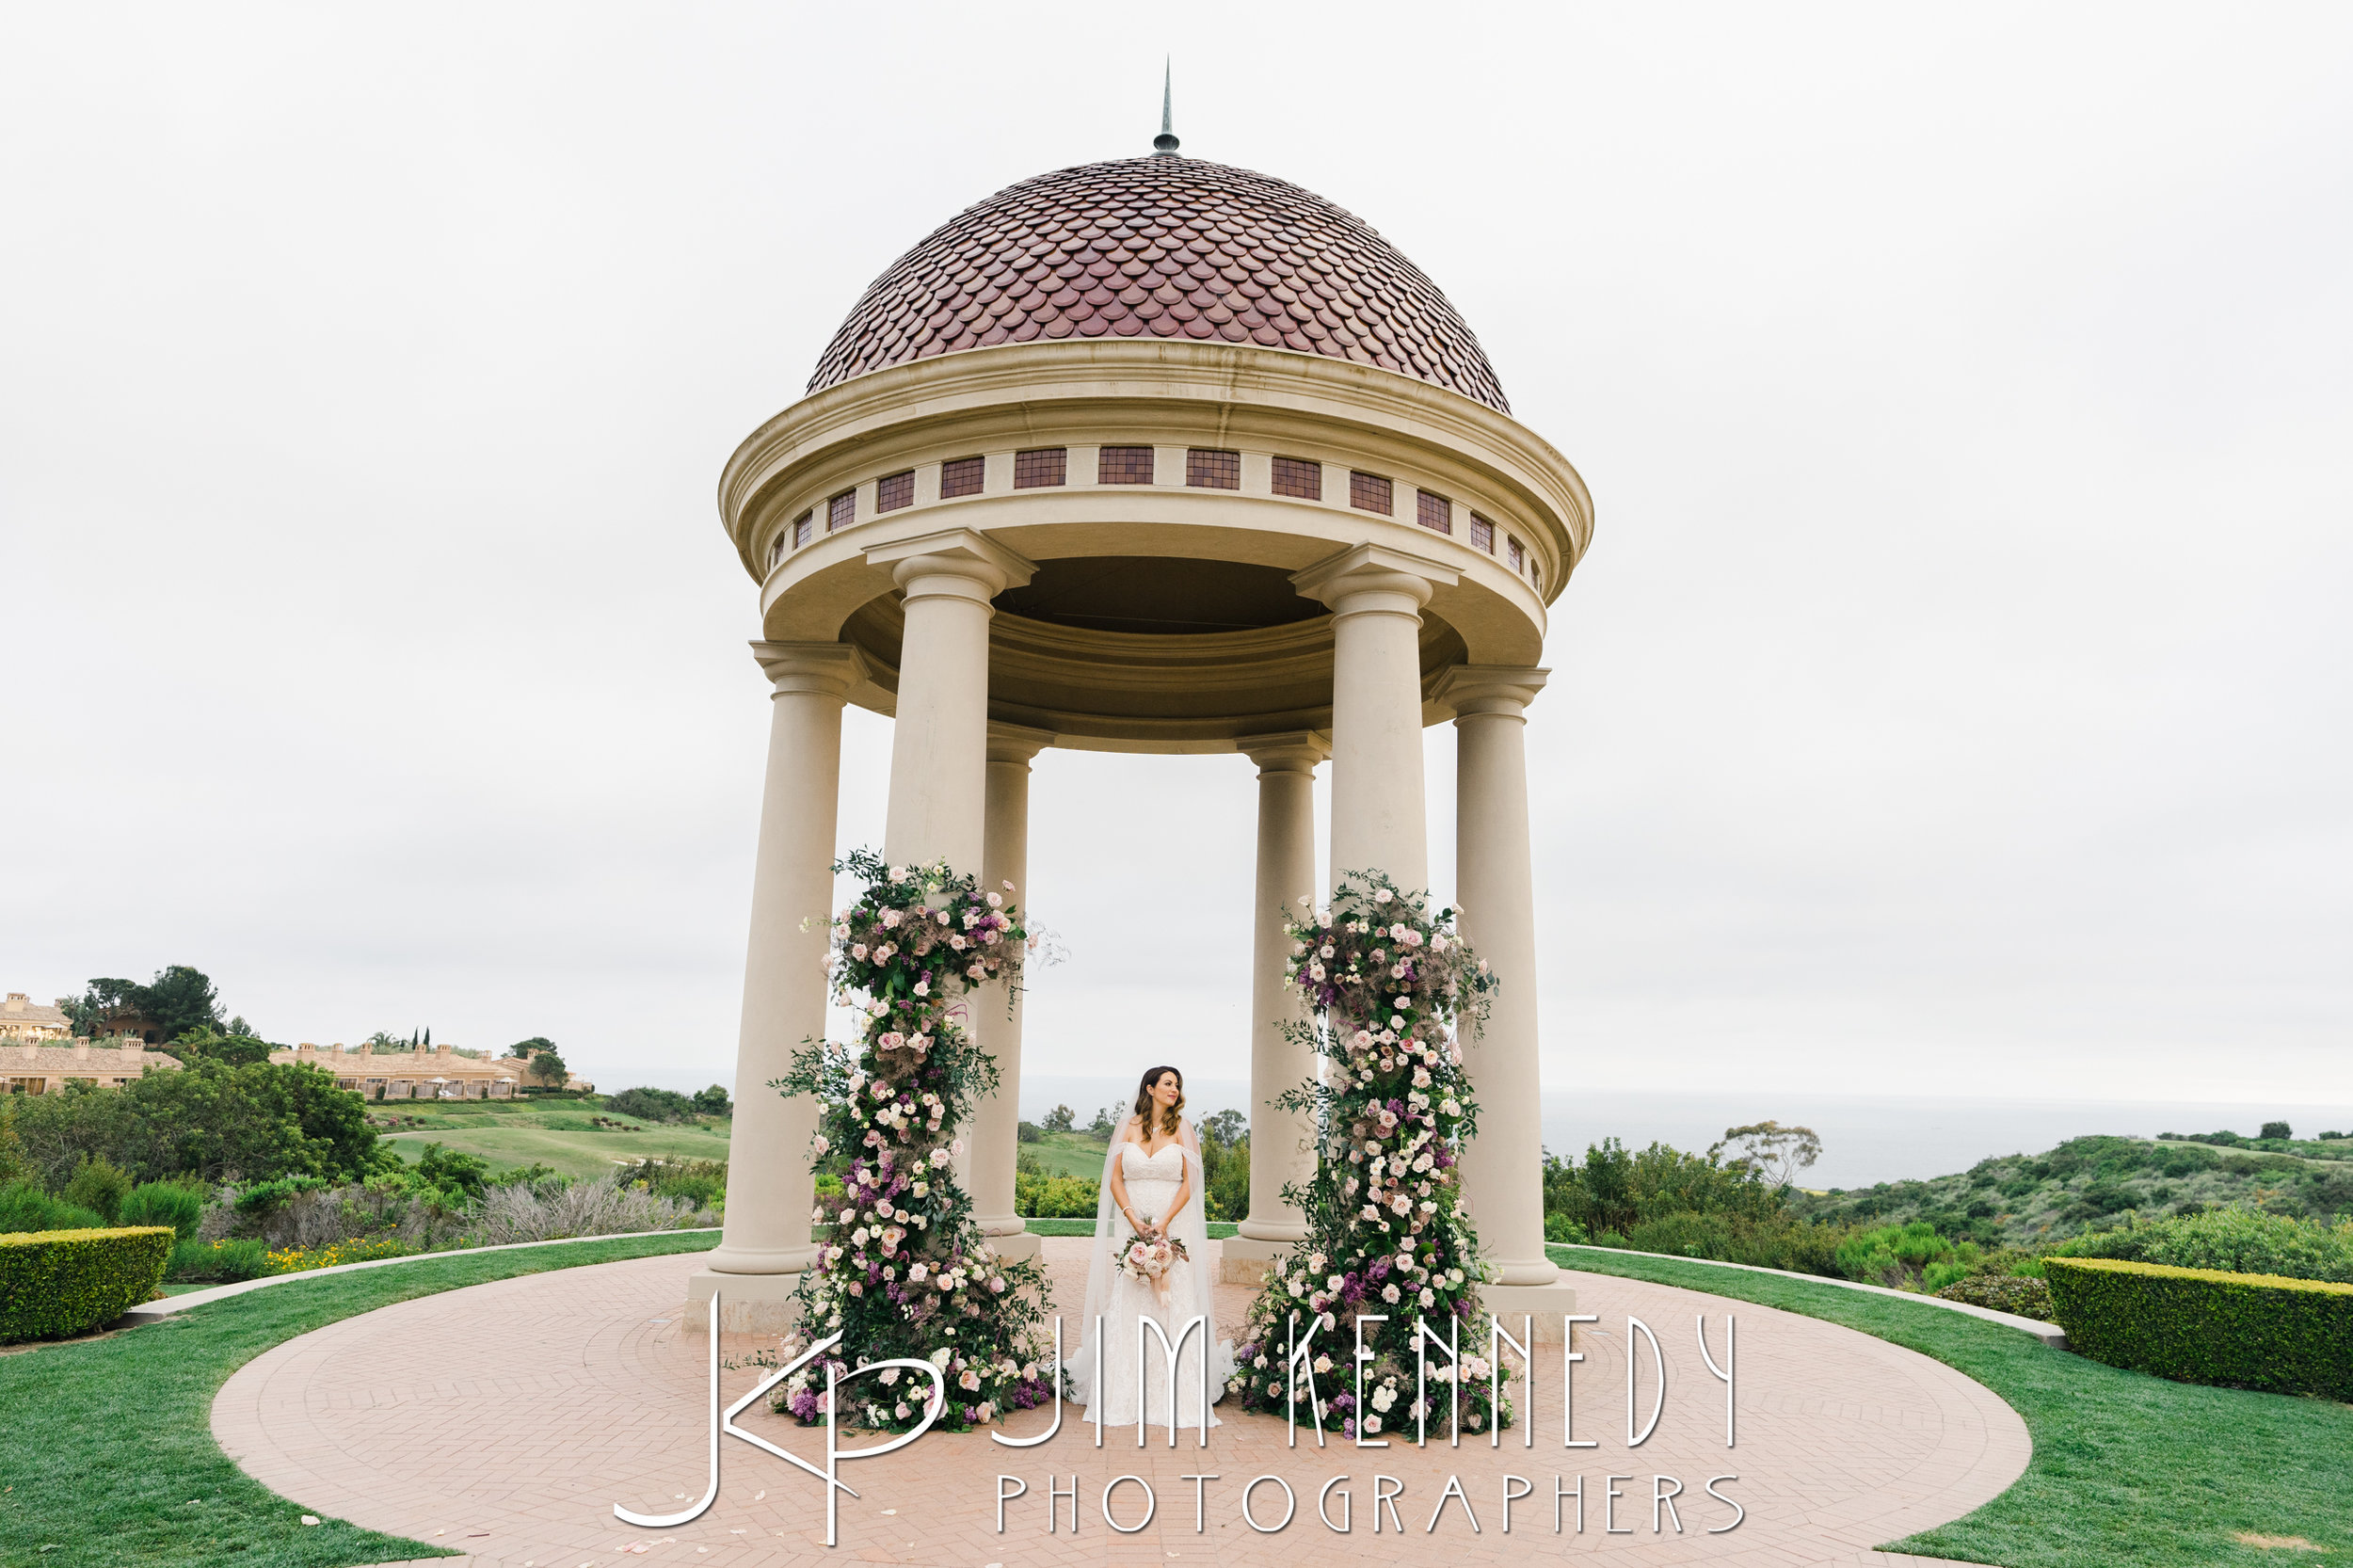 pelican-hill-wedding-jim-kenedy-photographers_0160.JPG